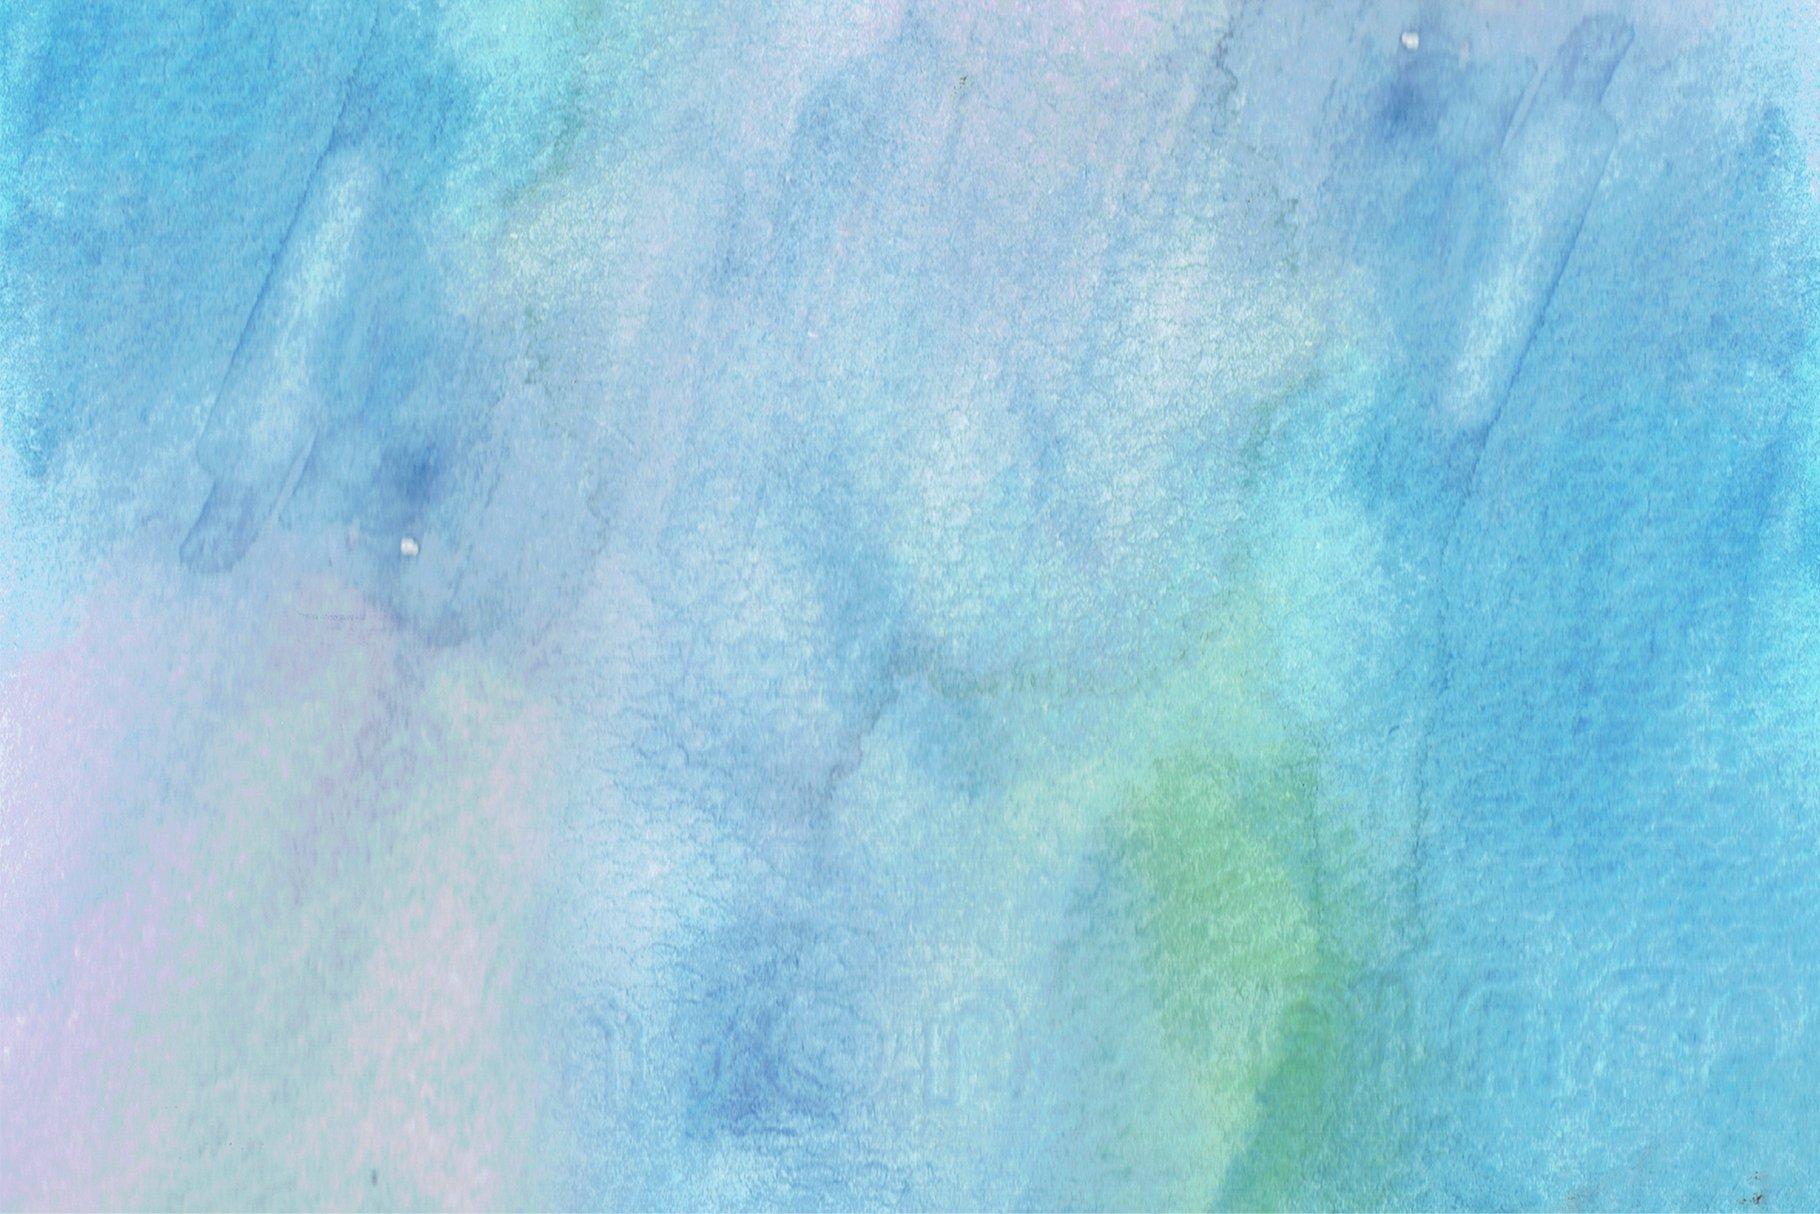 Soft Blue Nuance Watercolor Texture | Custom-Designed Textures ...